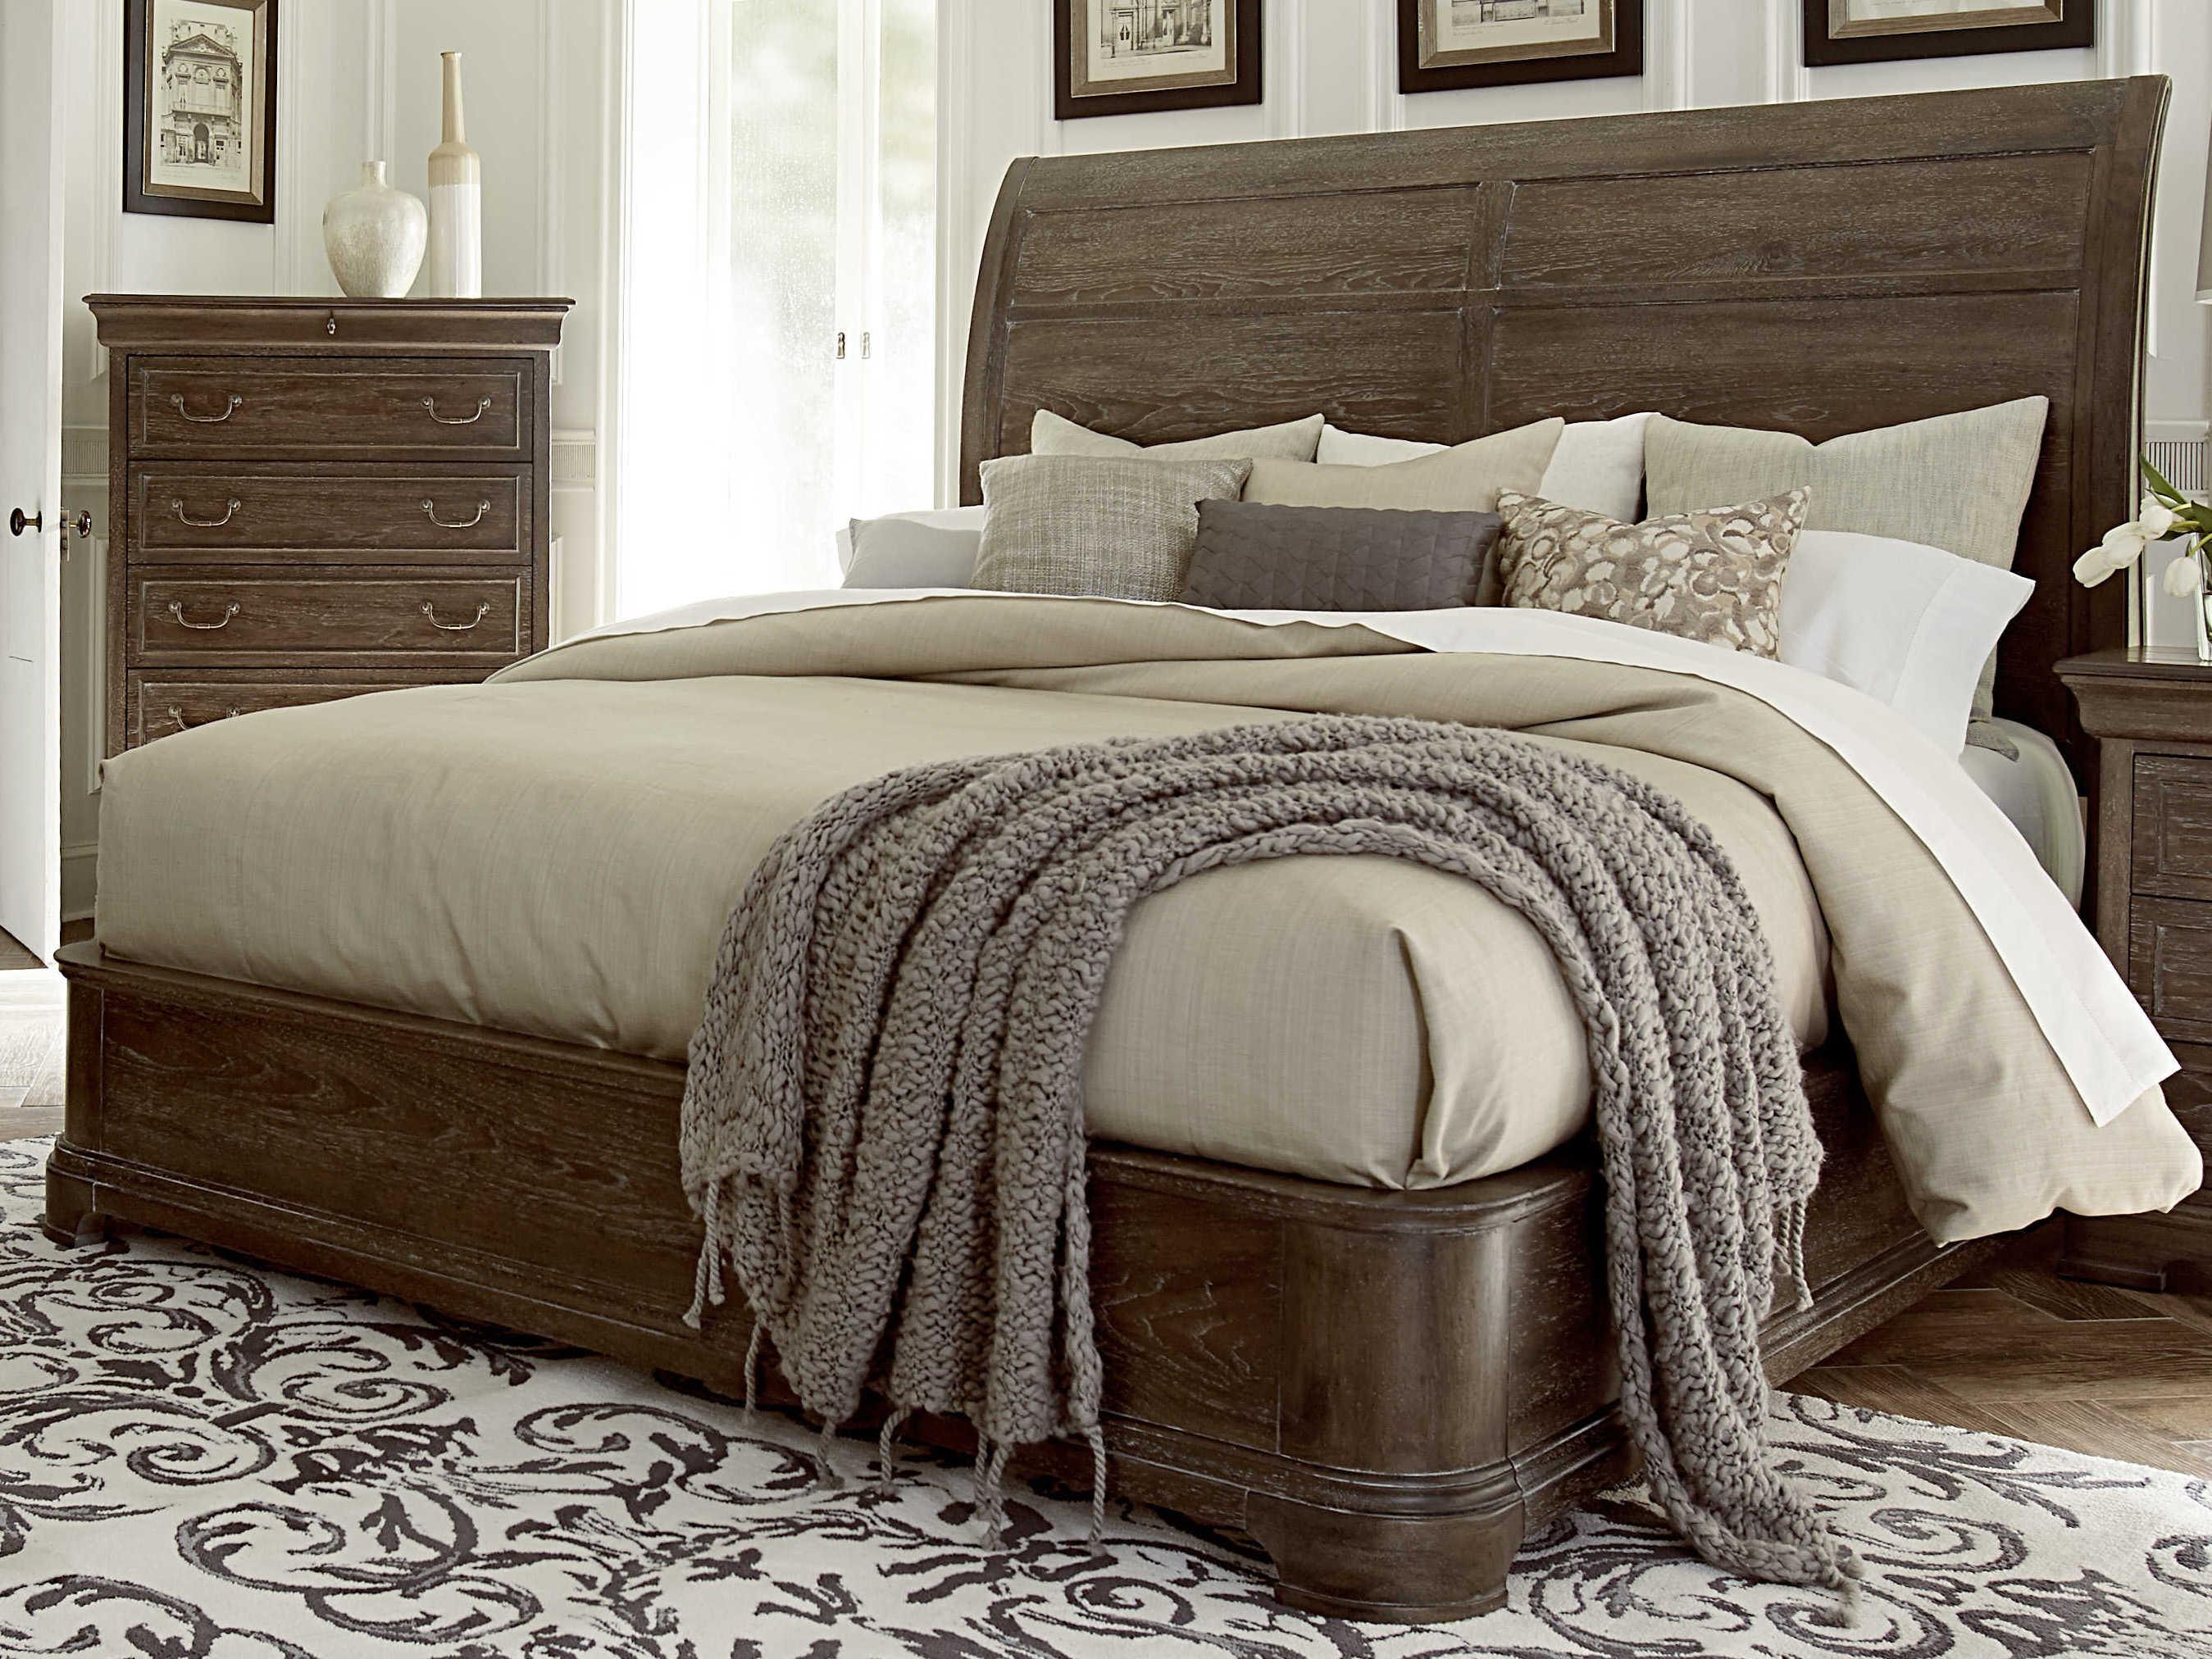 Genial A R T Furniture Saint Germain Coffee Queen Size Platform Sleigh Bed